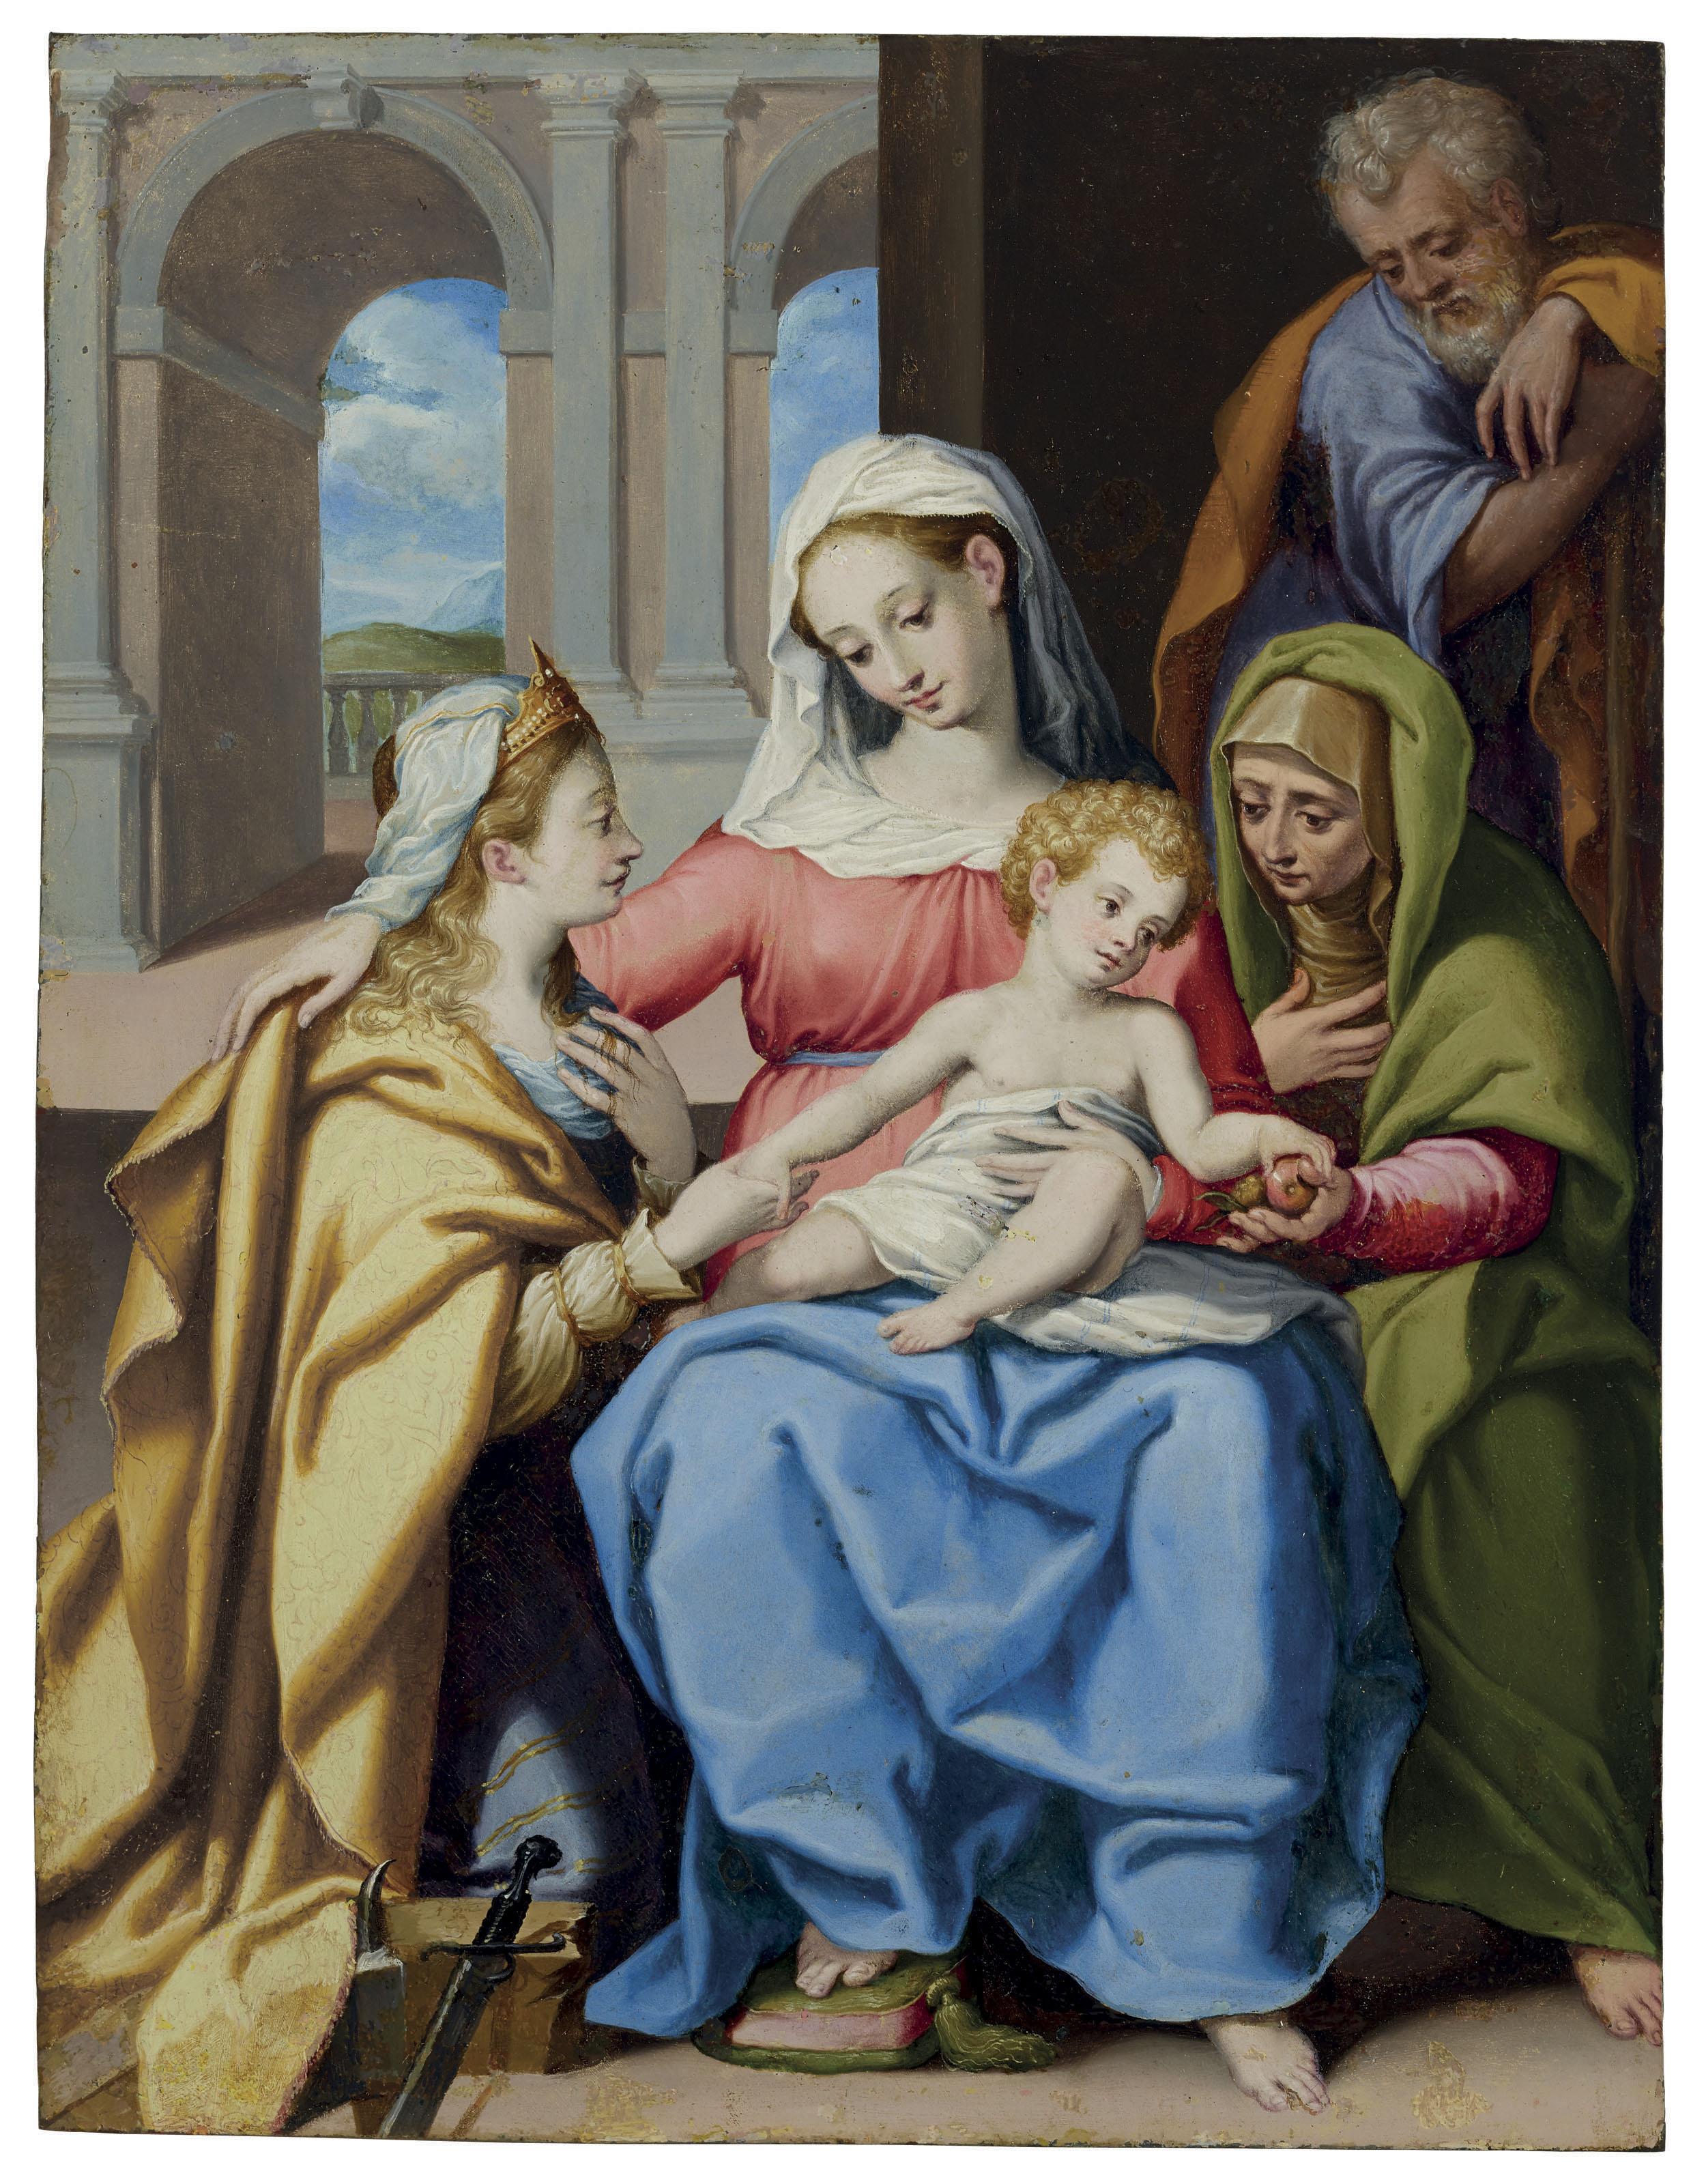 Bartolomeo Cesi (Bologna 1556-